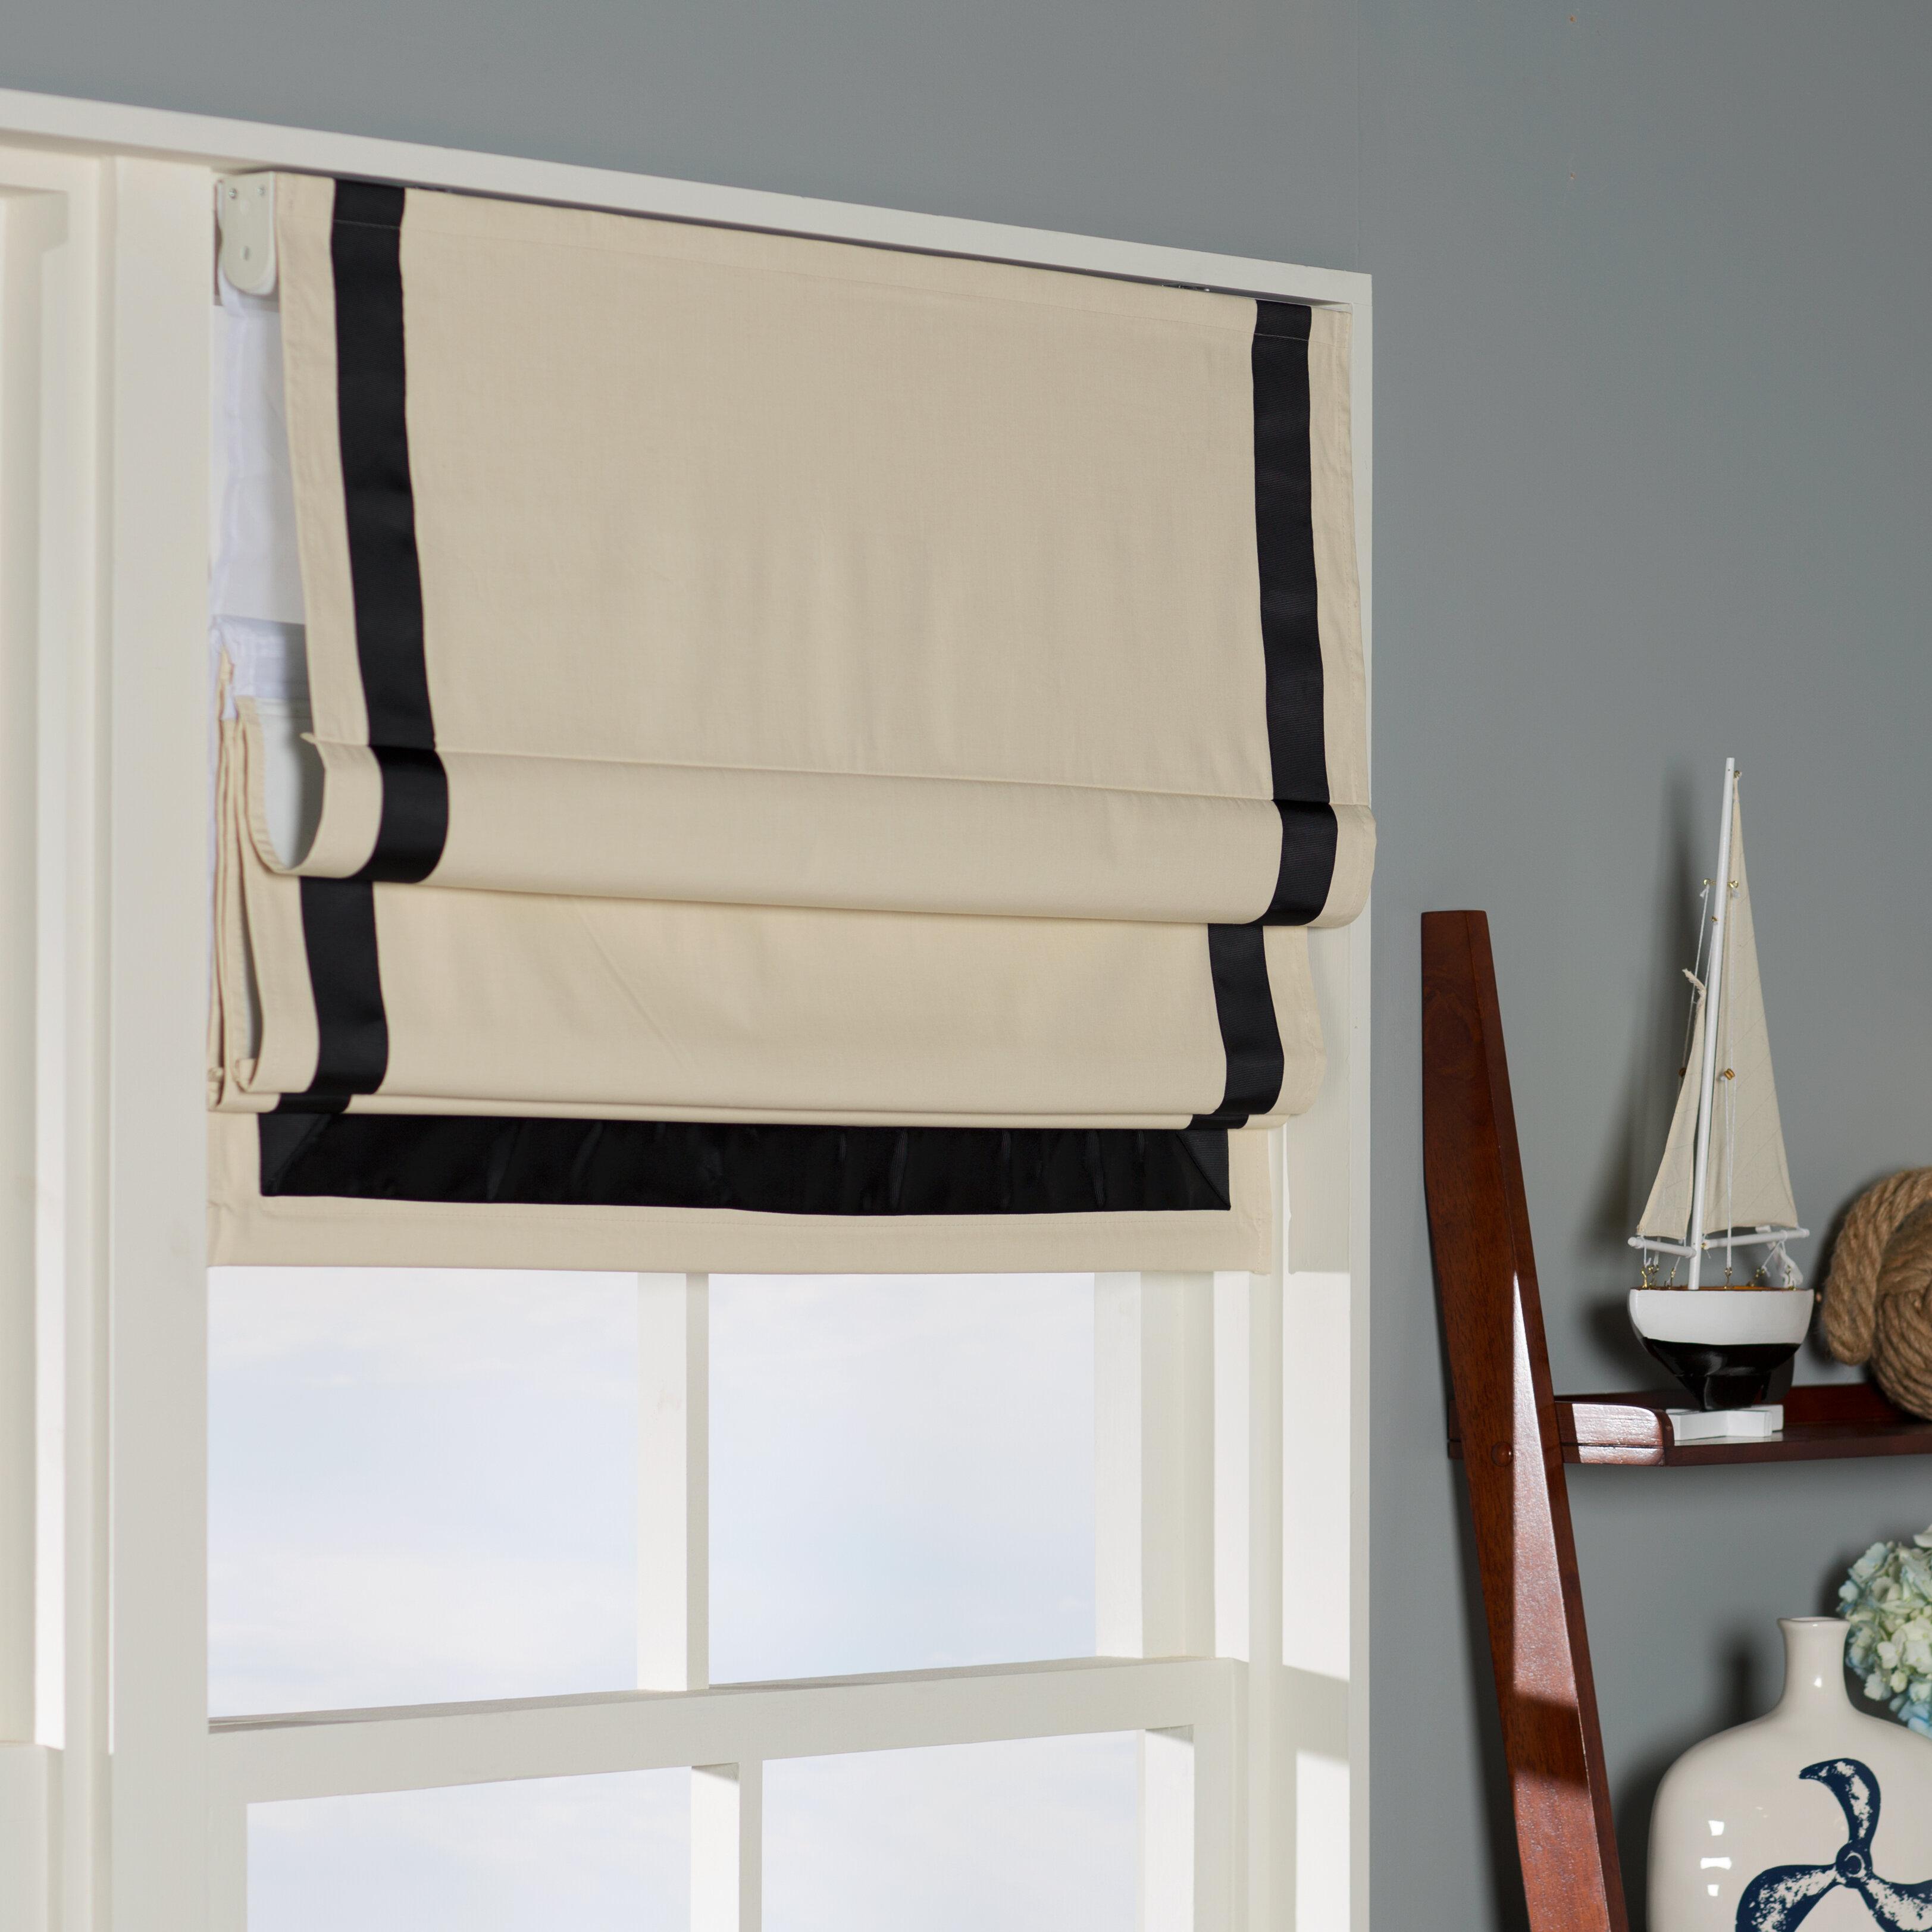 Beachcrest Home Indoor Cordless Blackout Roman Shade Reviews Wayfair